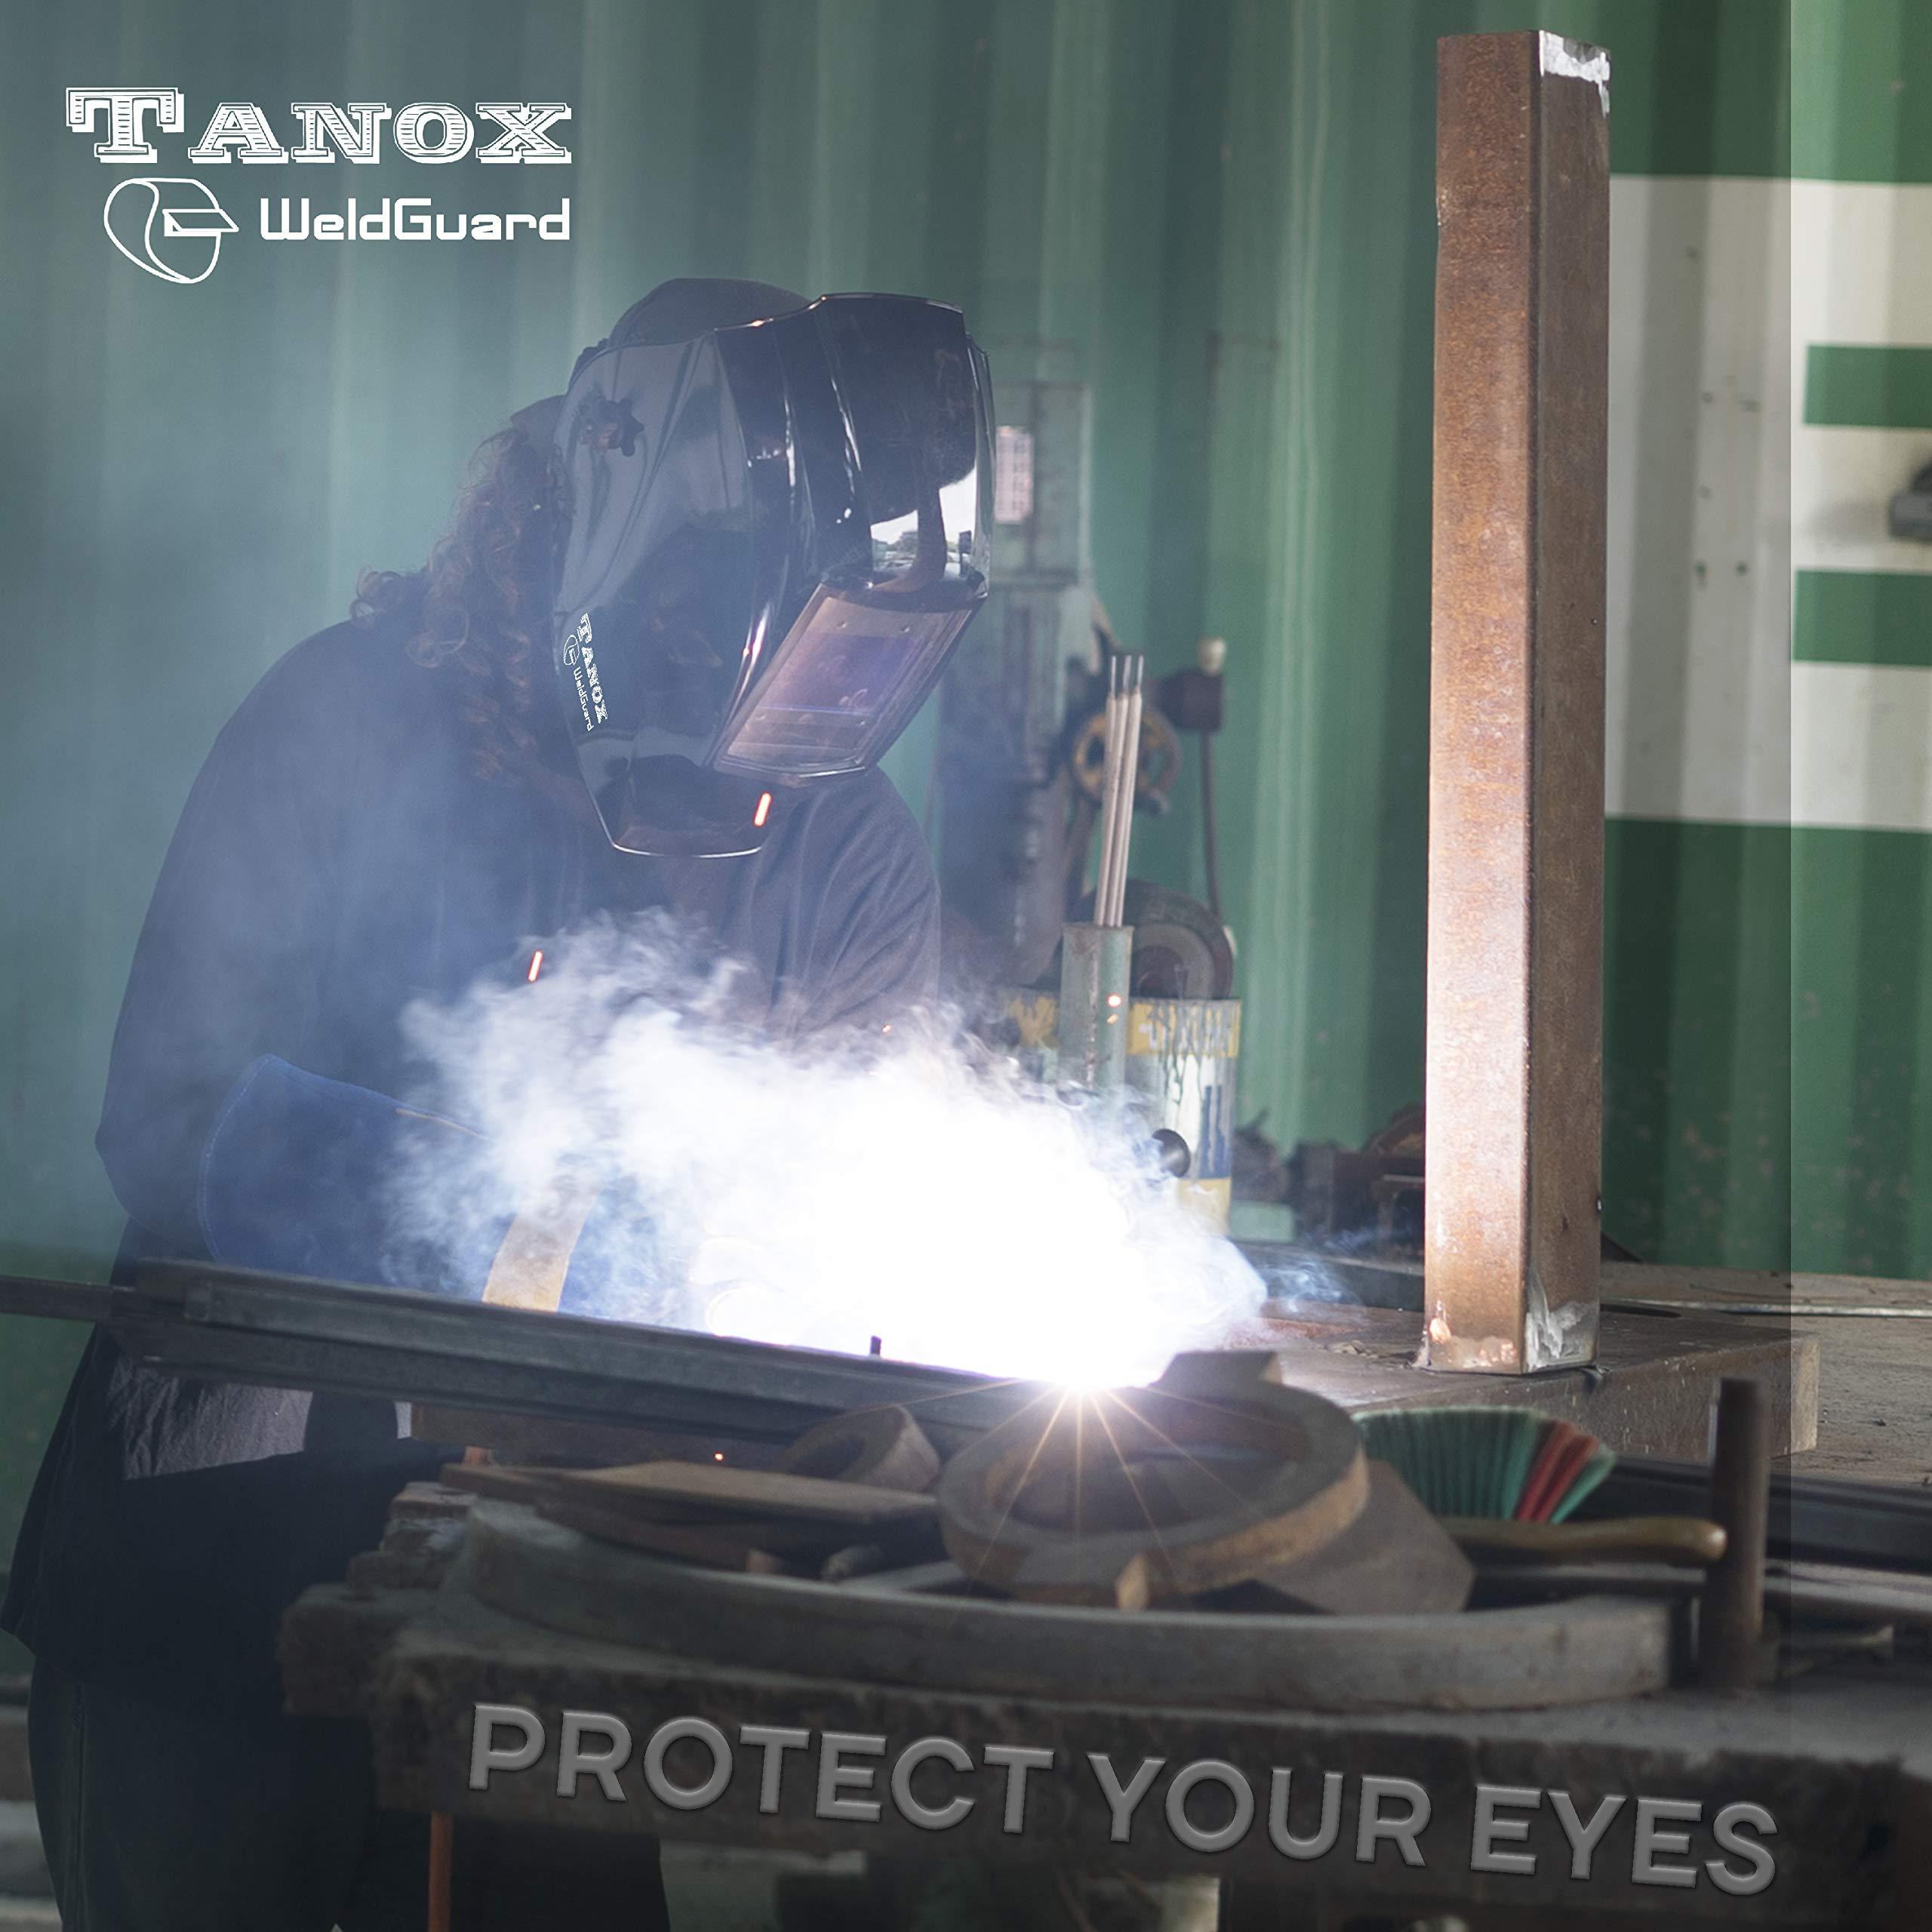 Digital Display auto Darkening Solar Powered Welding Helmet ADF-210S, Solar Shade Lens, Tig Mig MMA, Adjustable Range 4/9-1316 Bonus 16'' Fire Retardant Welding Gloves, Carrying Bag and spare lens by Tanox (Image #2)